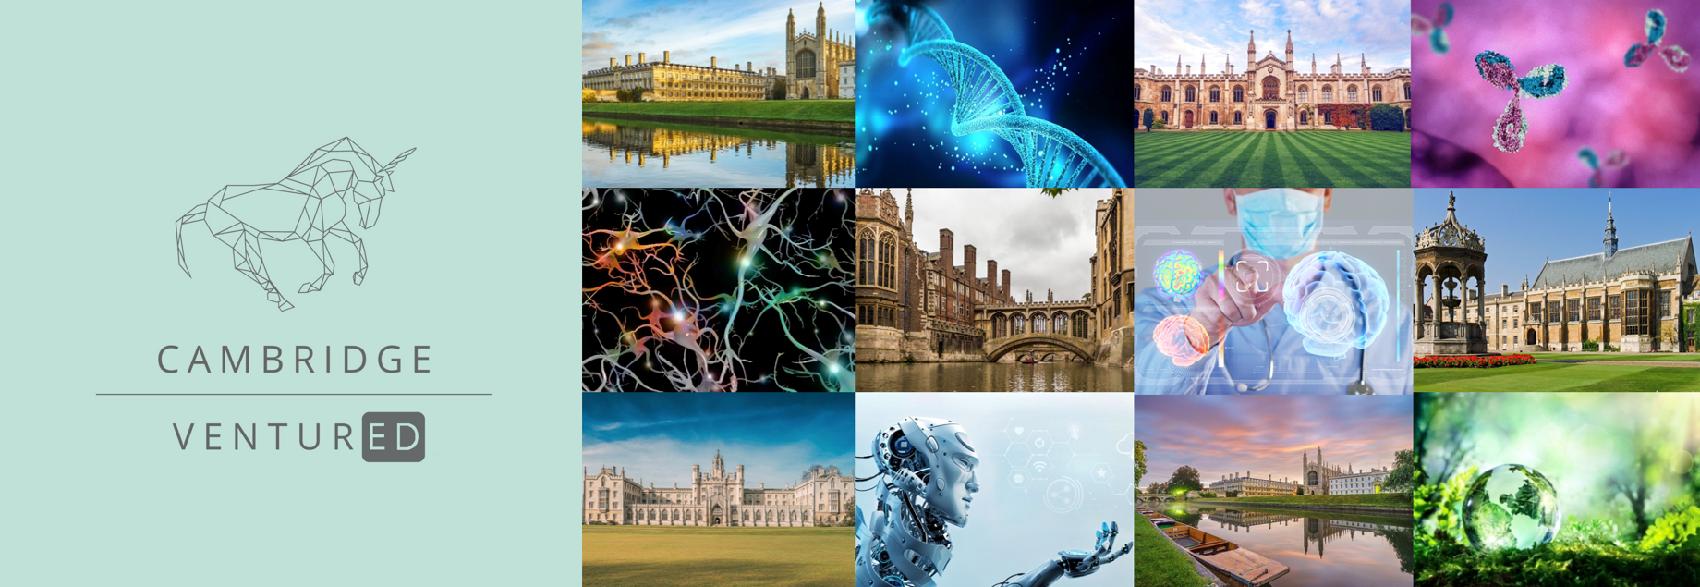 CambridgeVenturED_Header-1